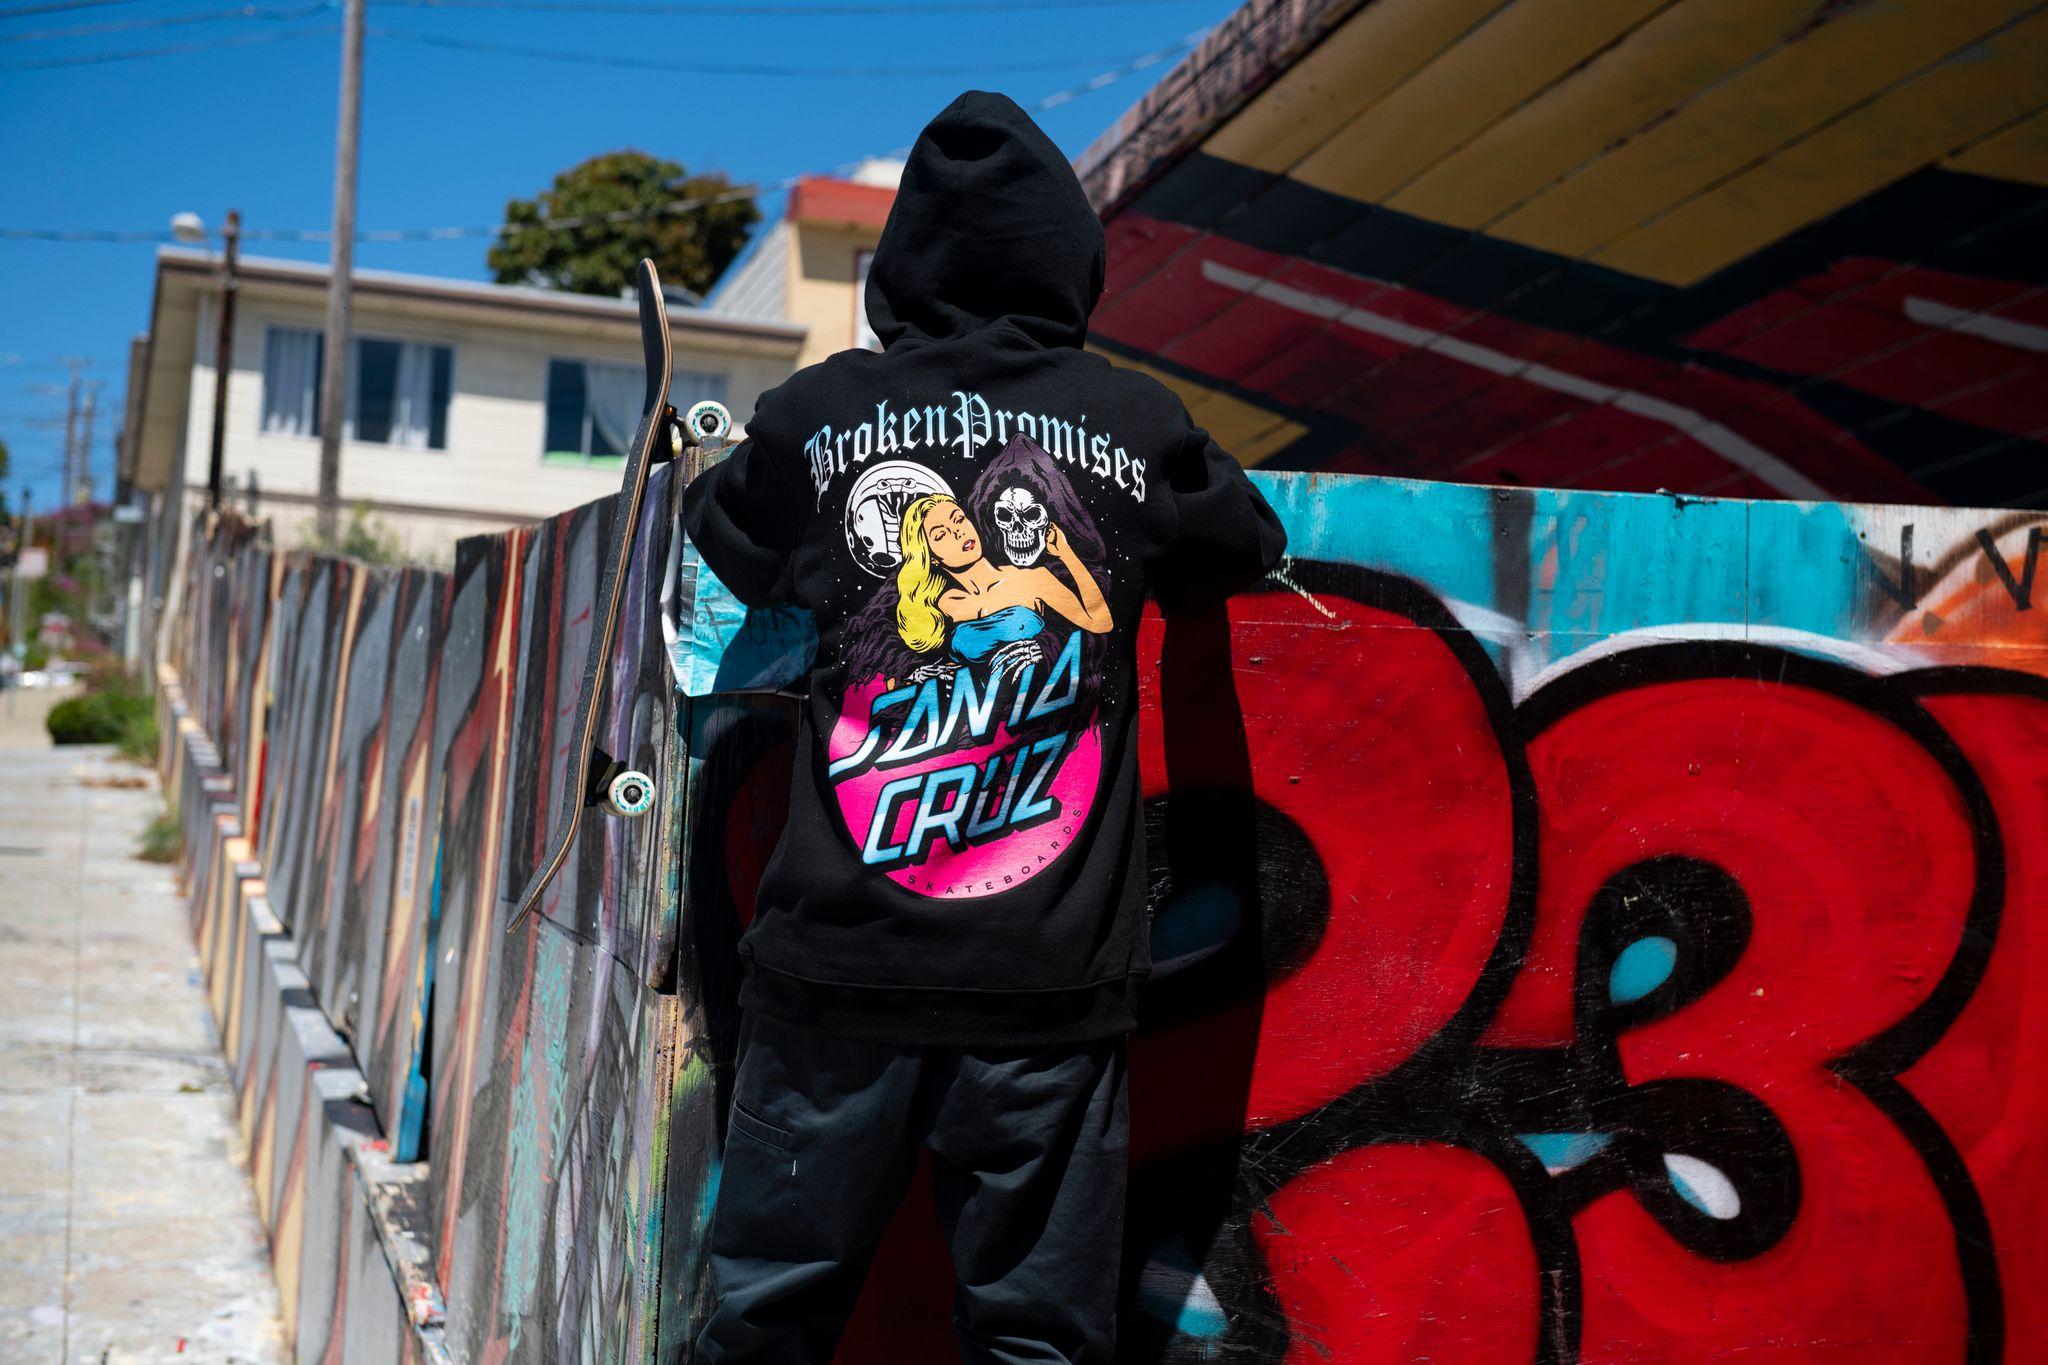 Broken Promises x Santa Cruz collection